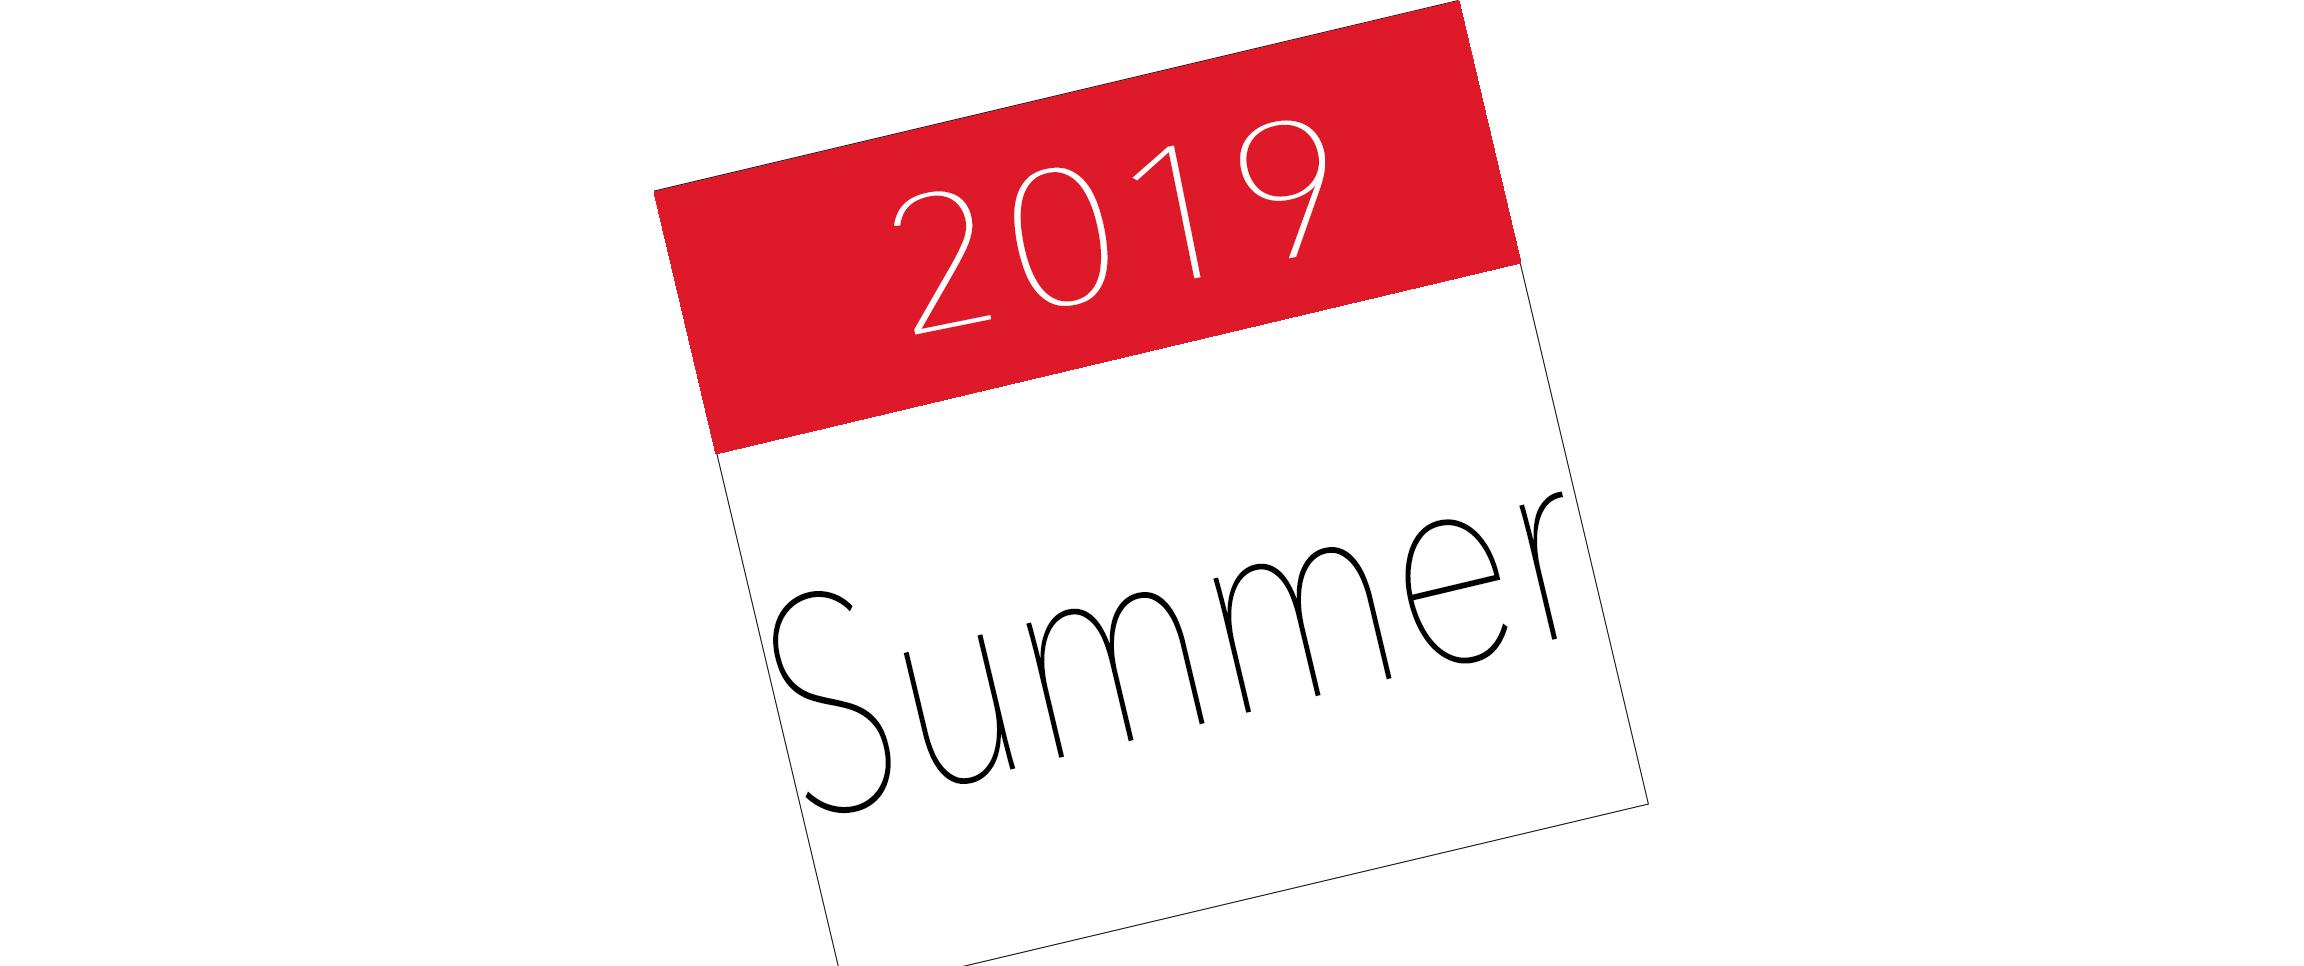 calendrier-site-summer-2019.jpg